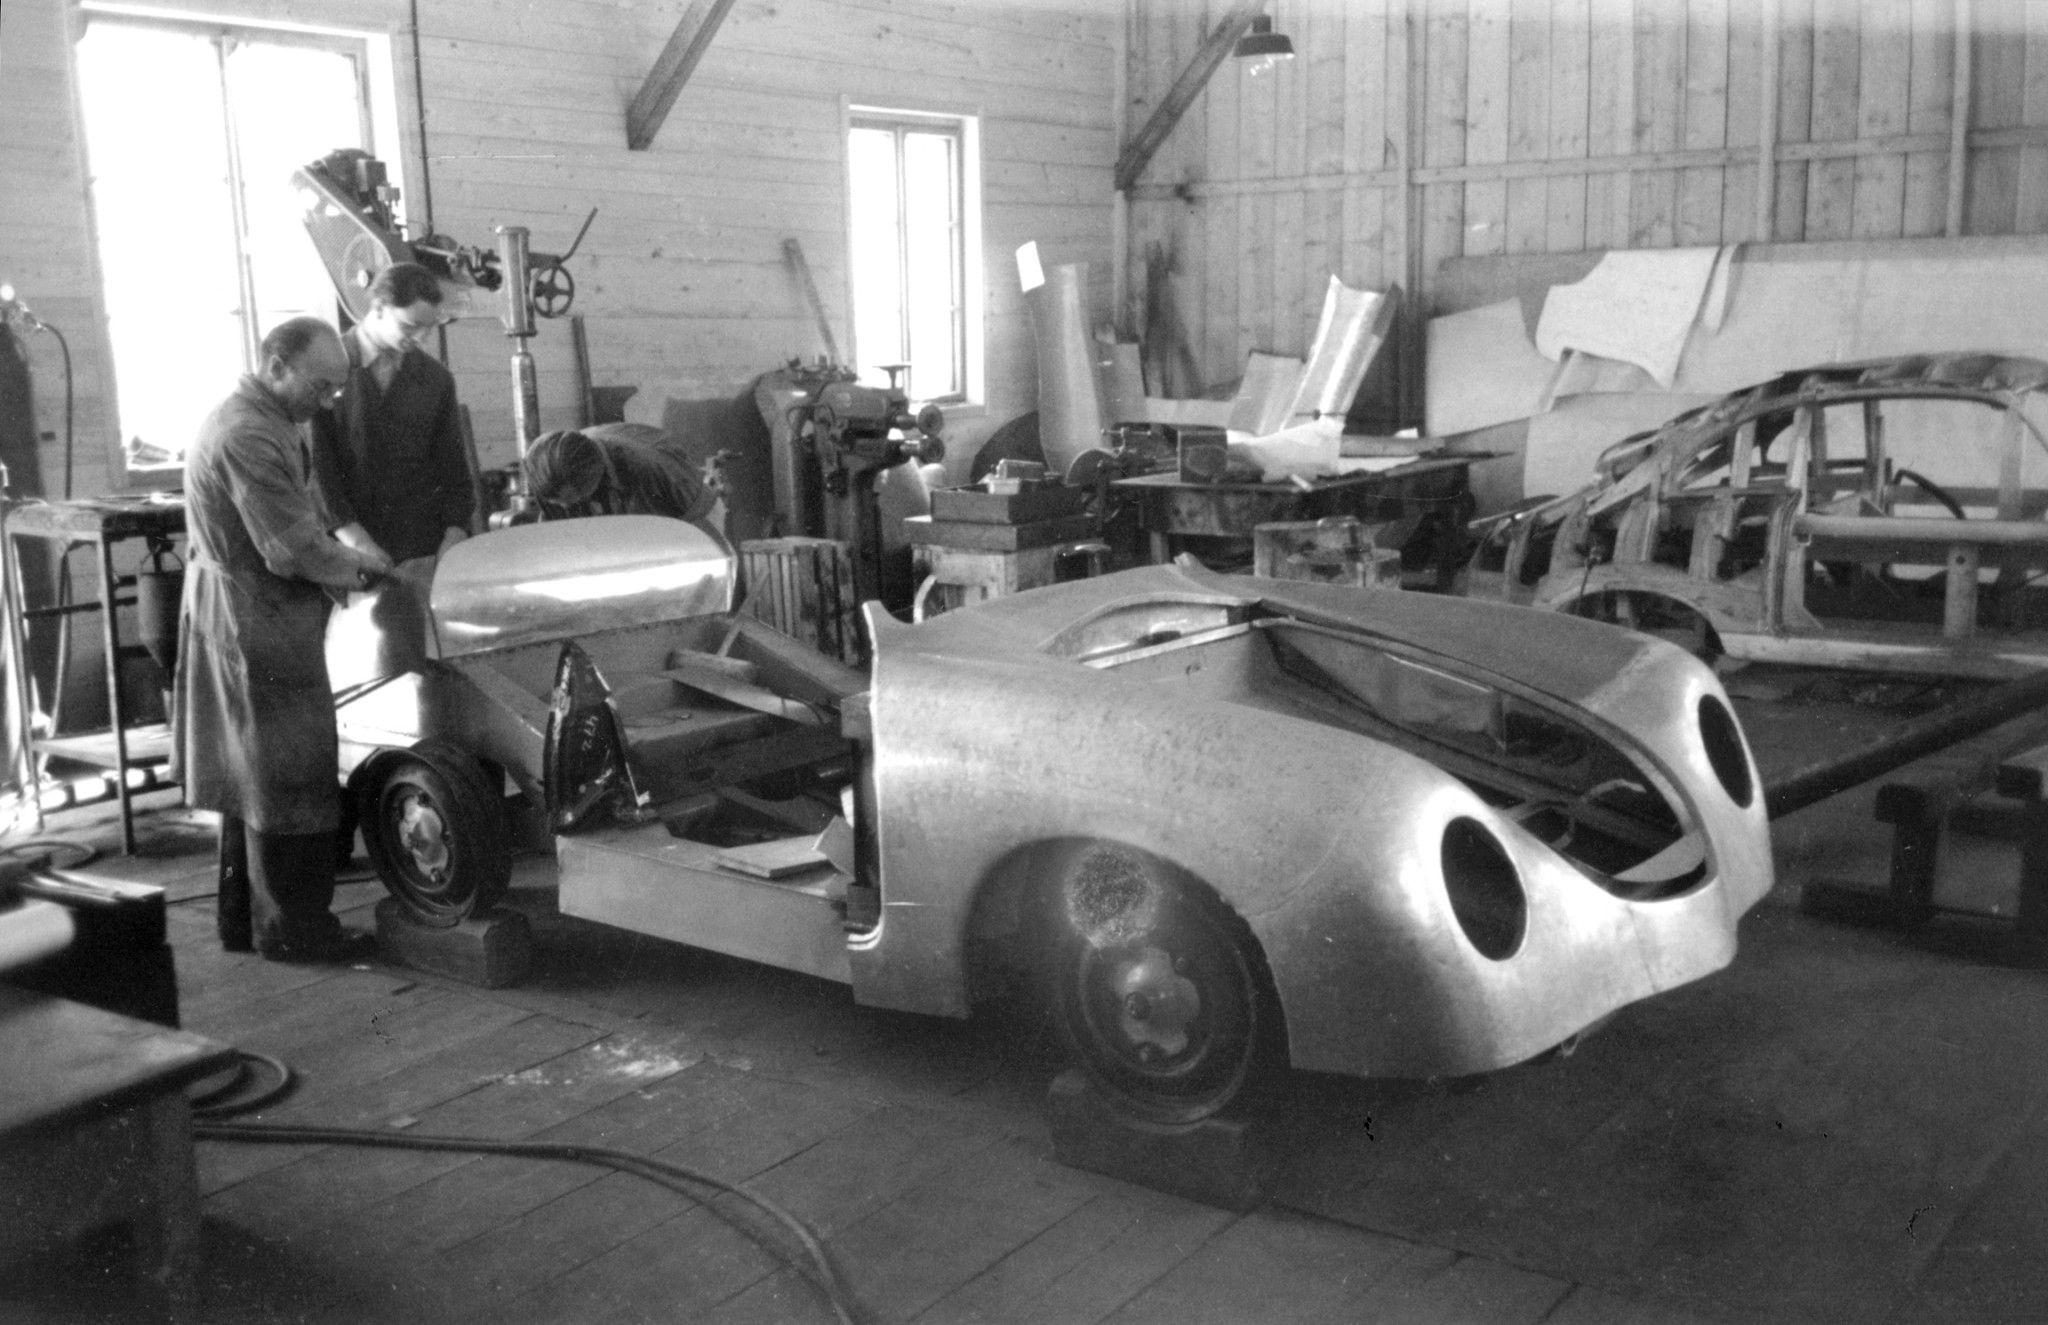 https://www.heacockclassic.com/wp-content/uploads/Porsche-Production-of-type-356.jpg